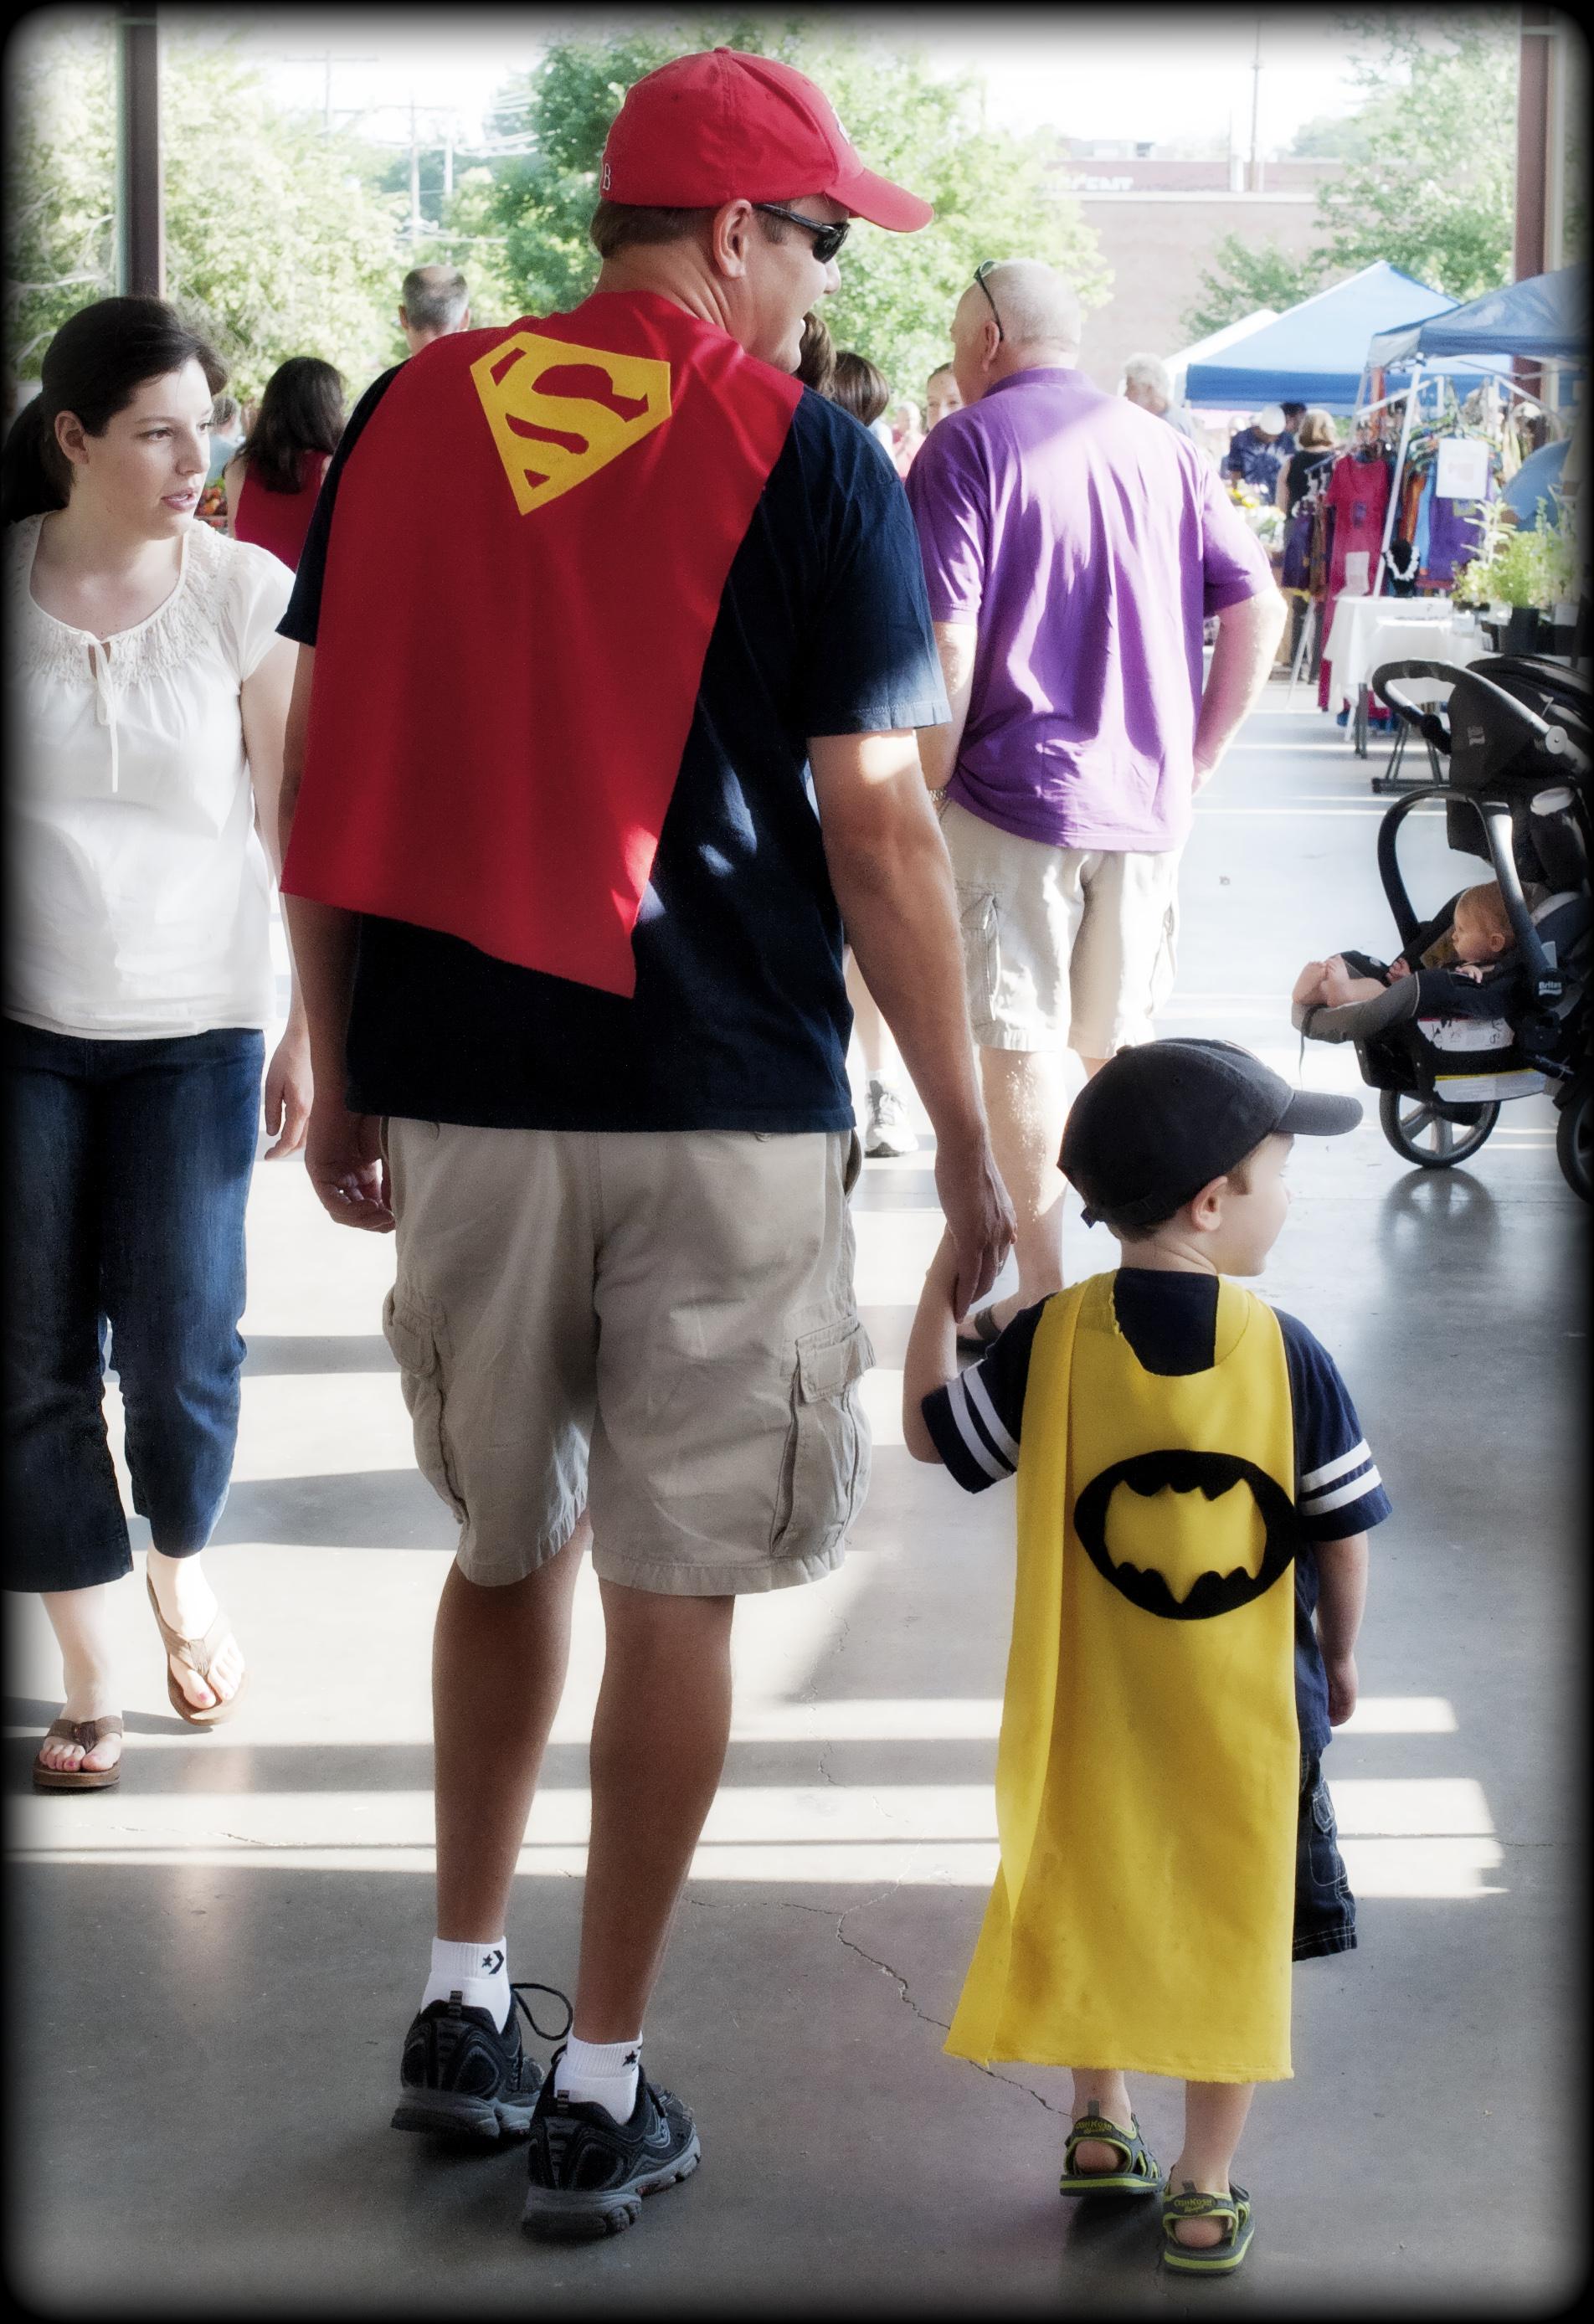 Durham_FarmersMarket_SuperMan&Batman_5262012.jpg